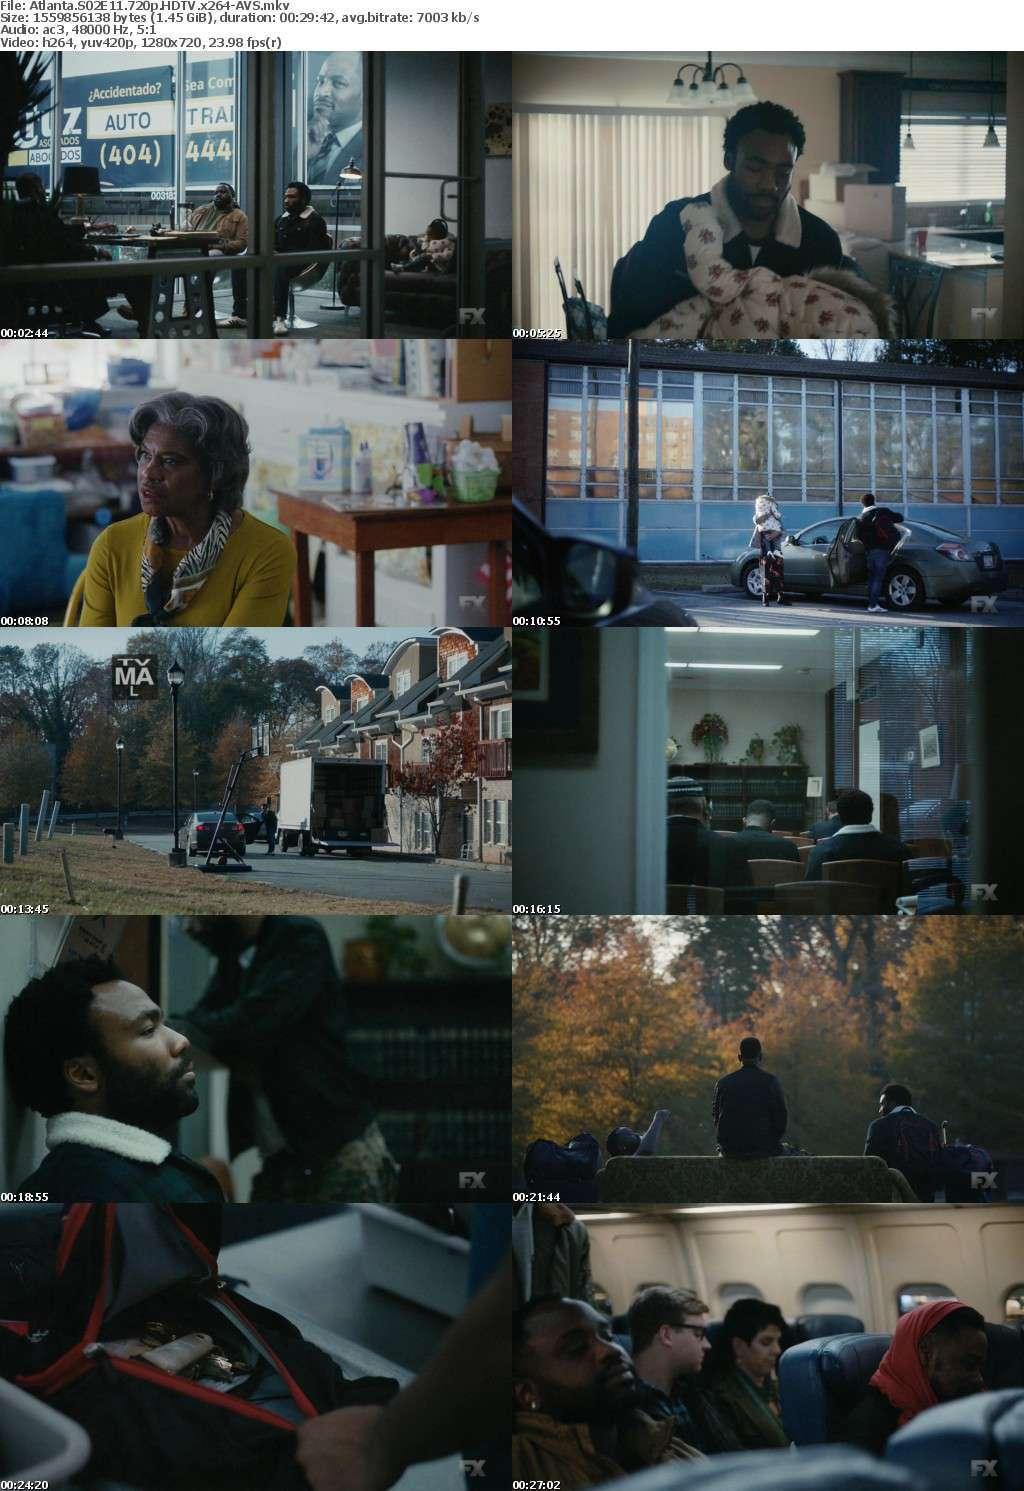 Atlanta S02E11 720p HDTV x264-AVS